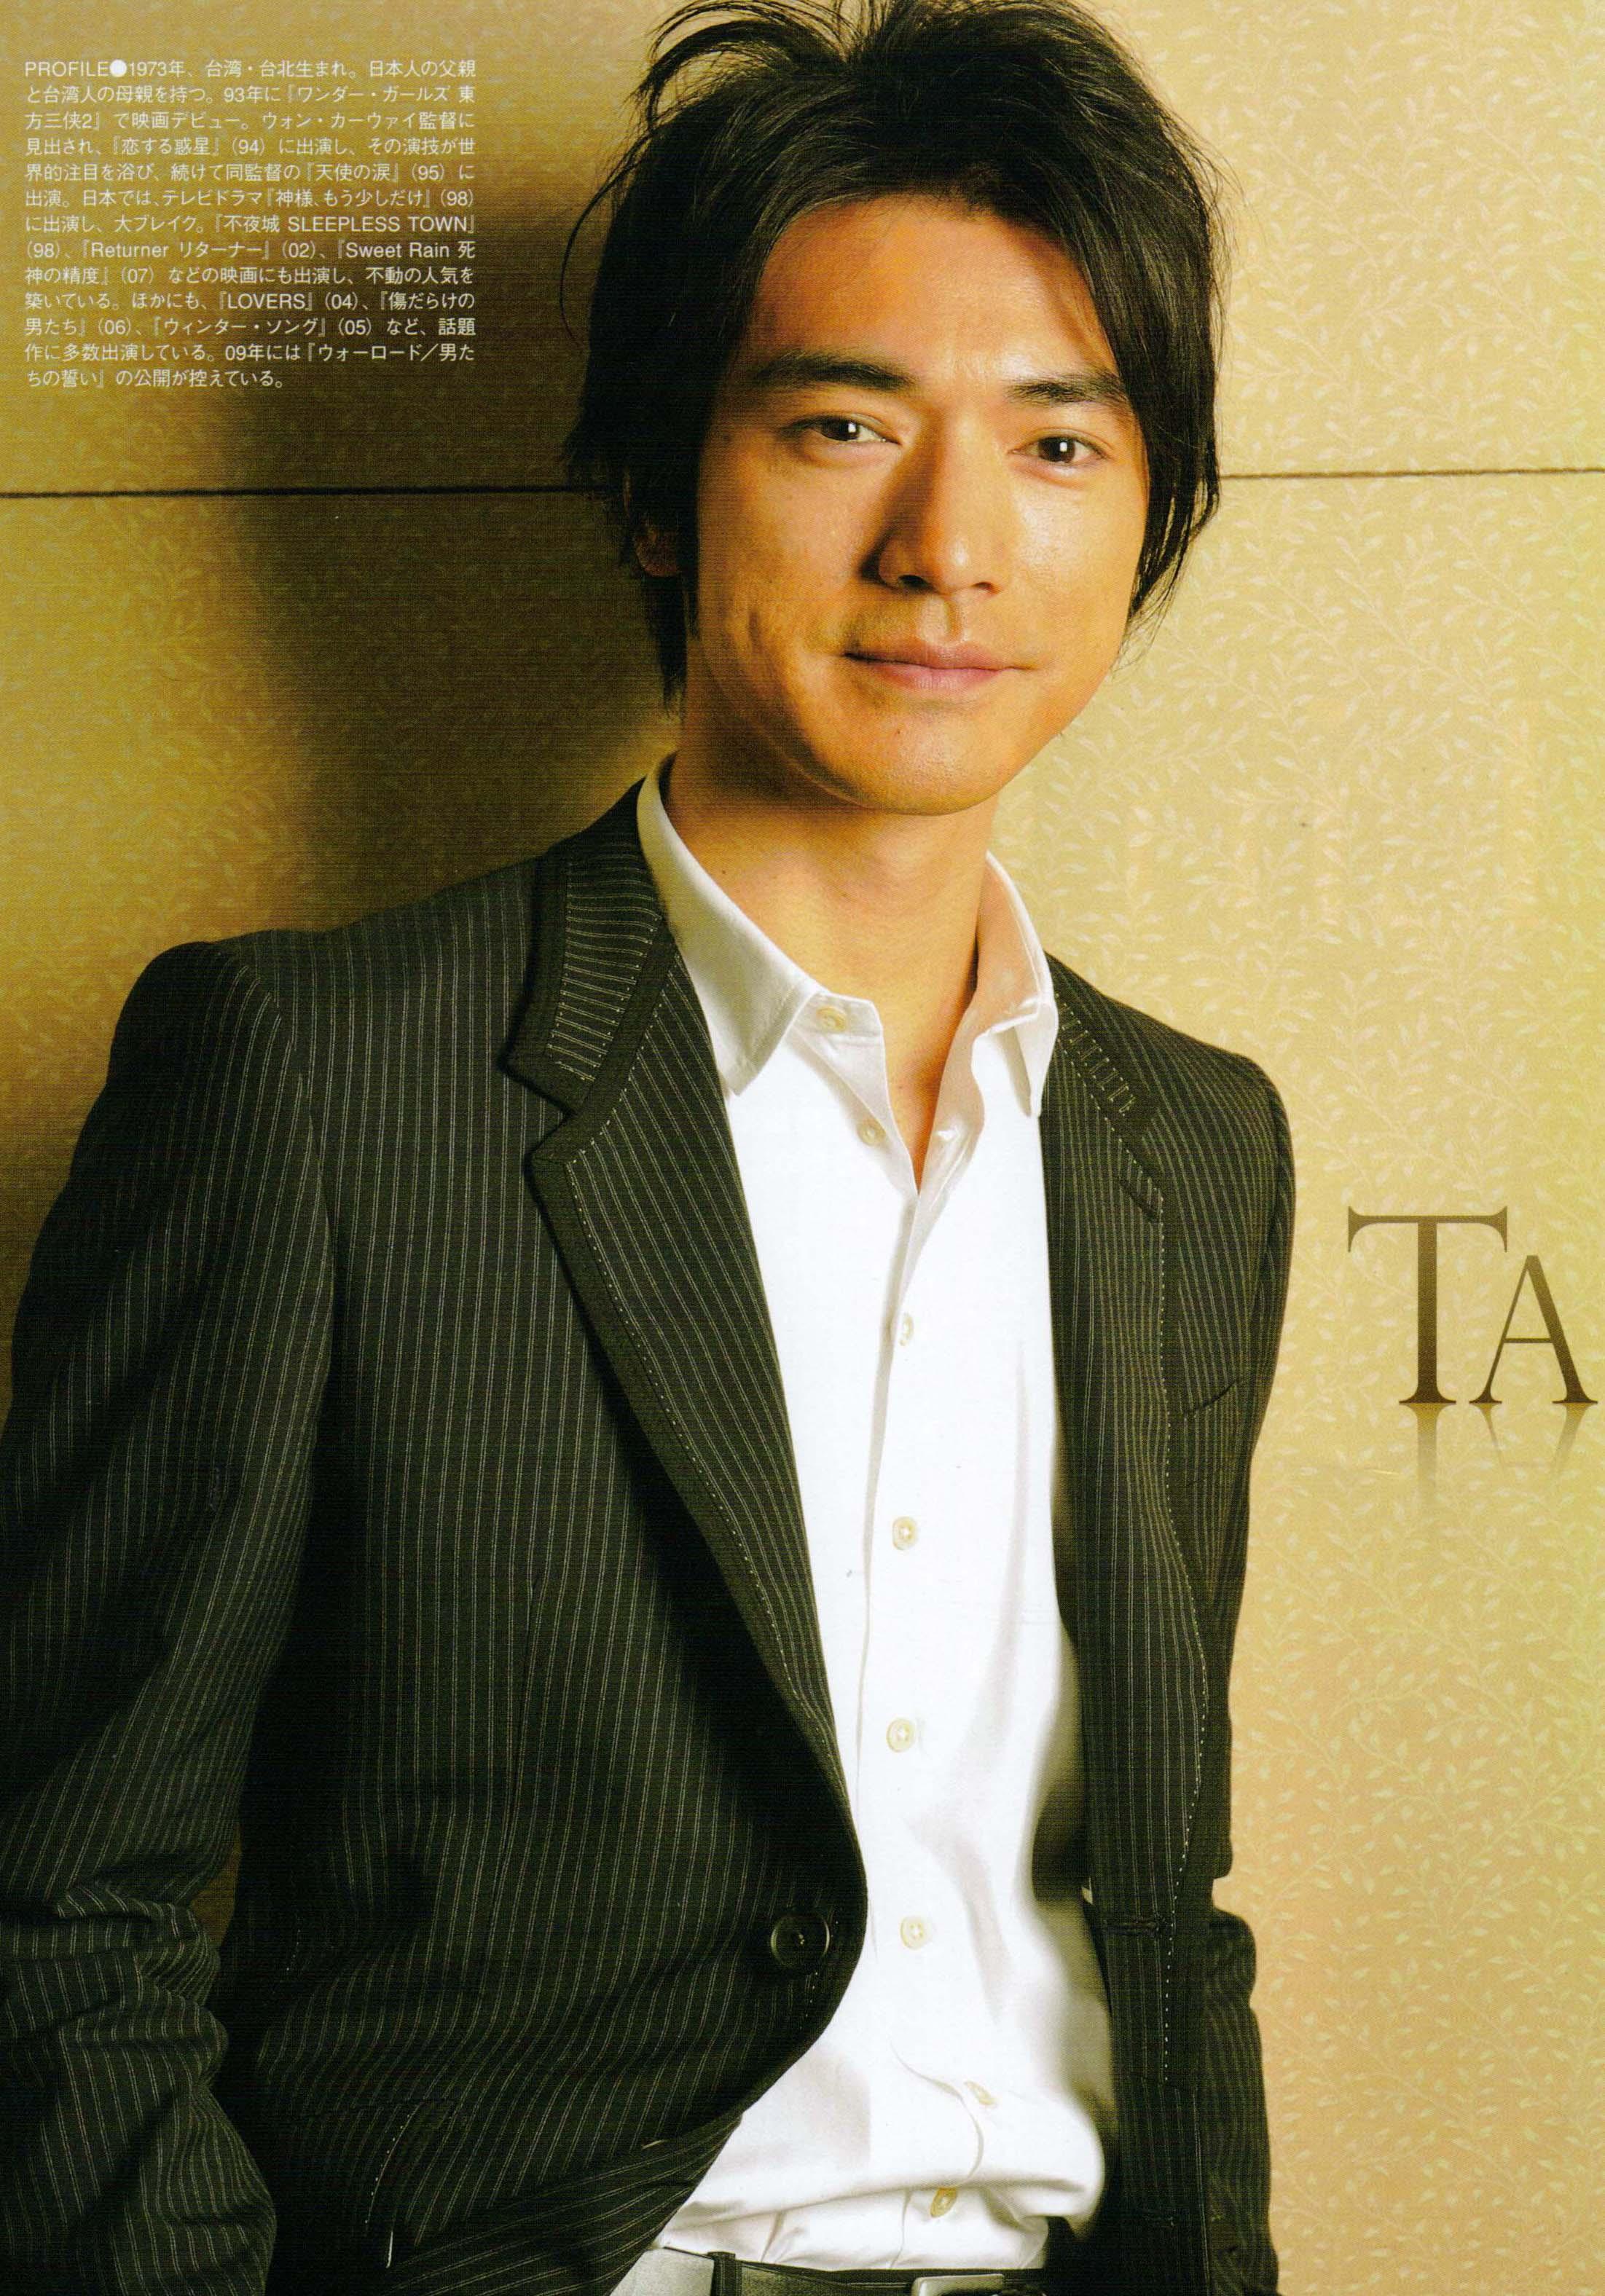 takeshi kaneshiro photo 54 of 66 pics wallpaper photo